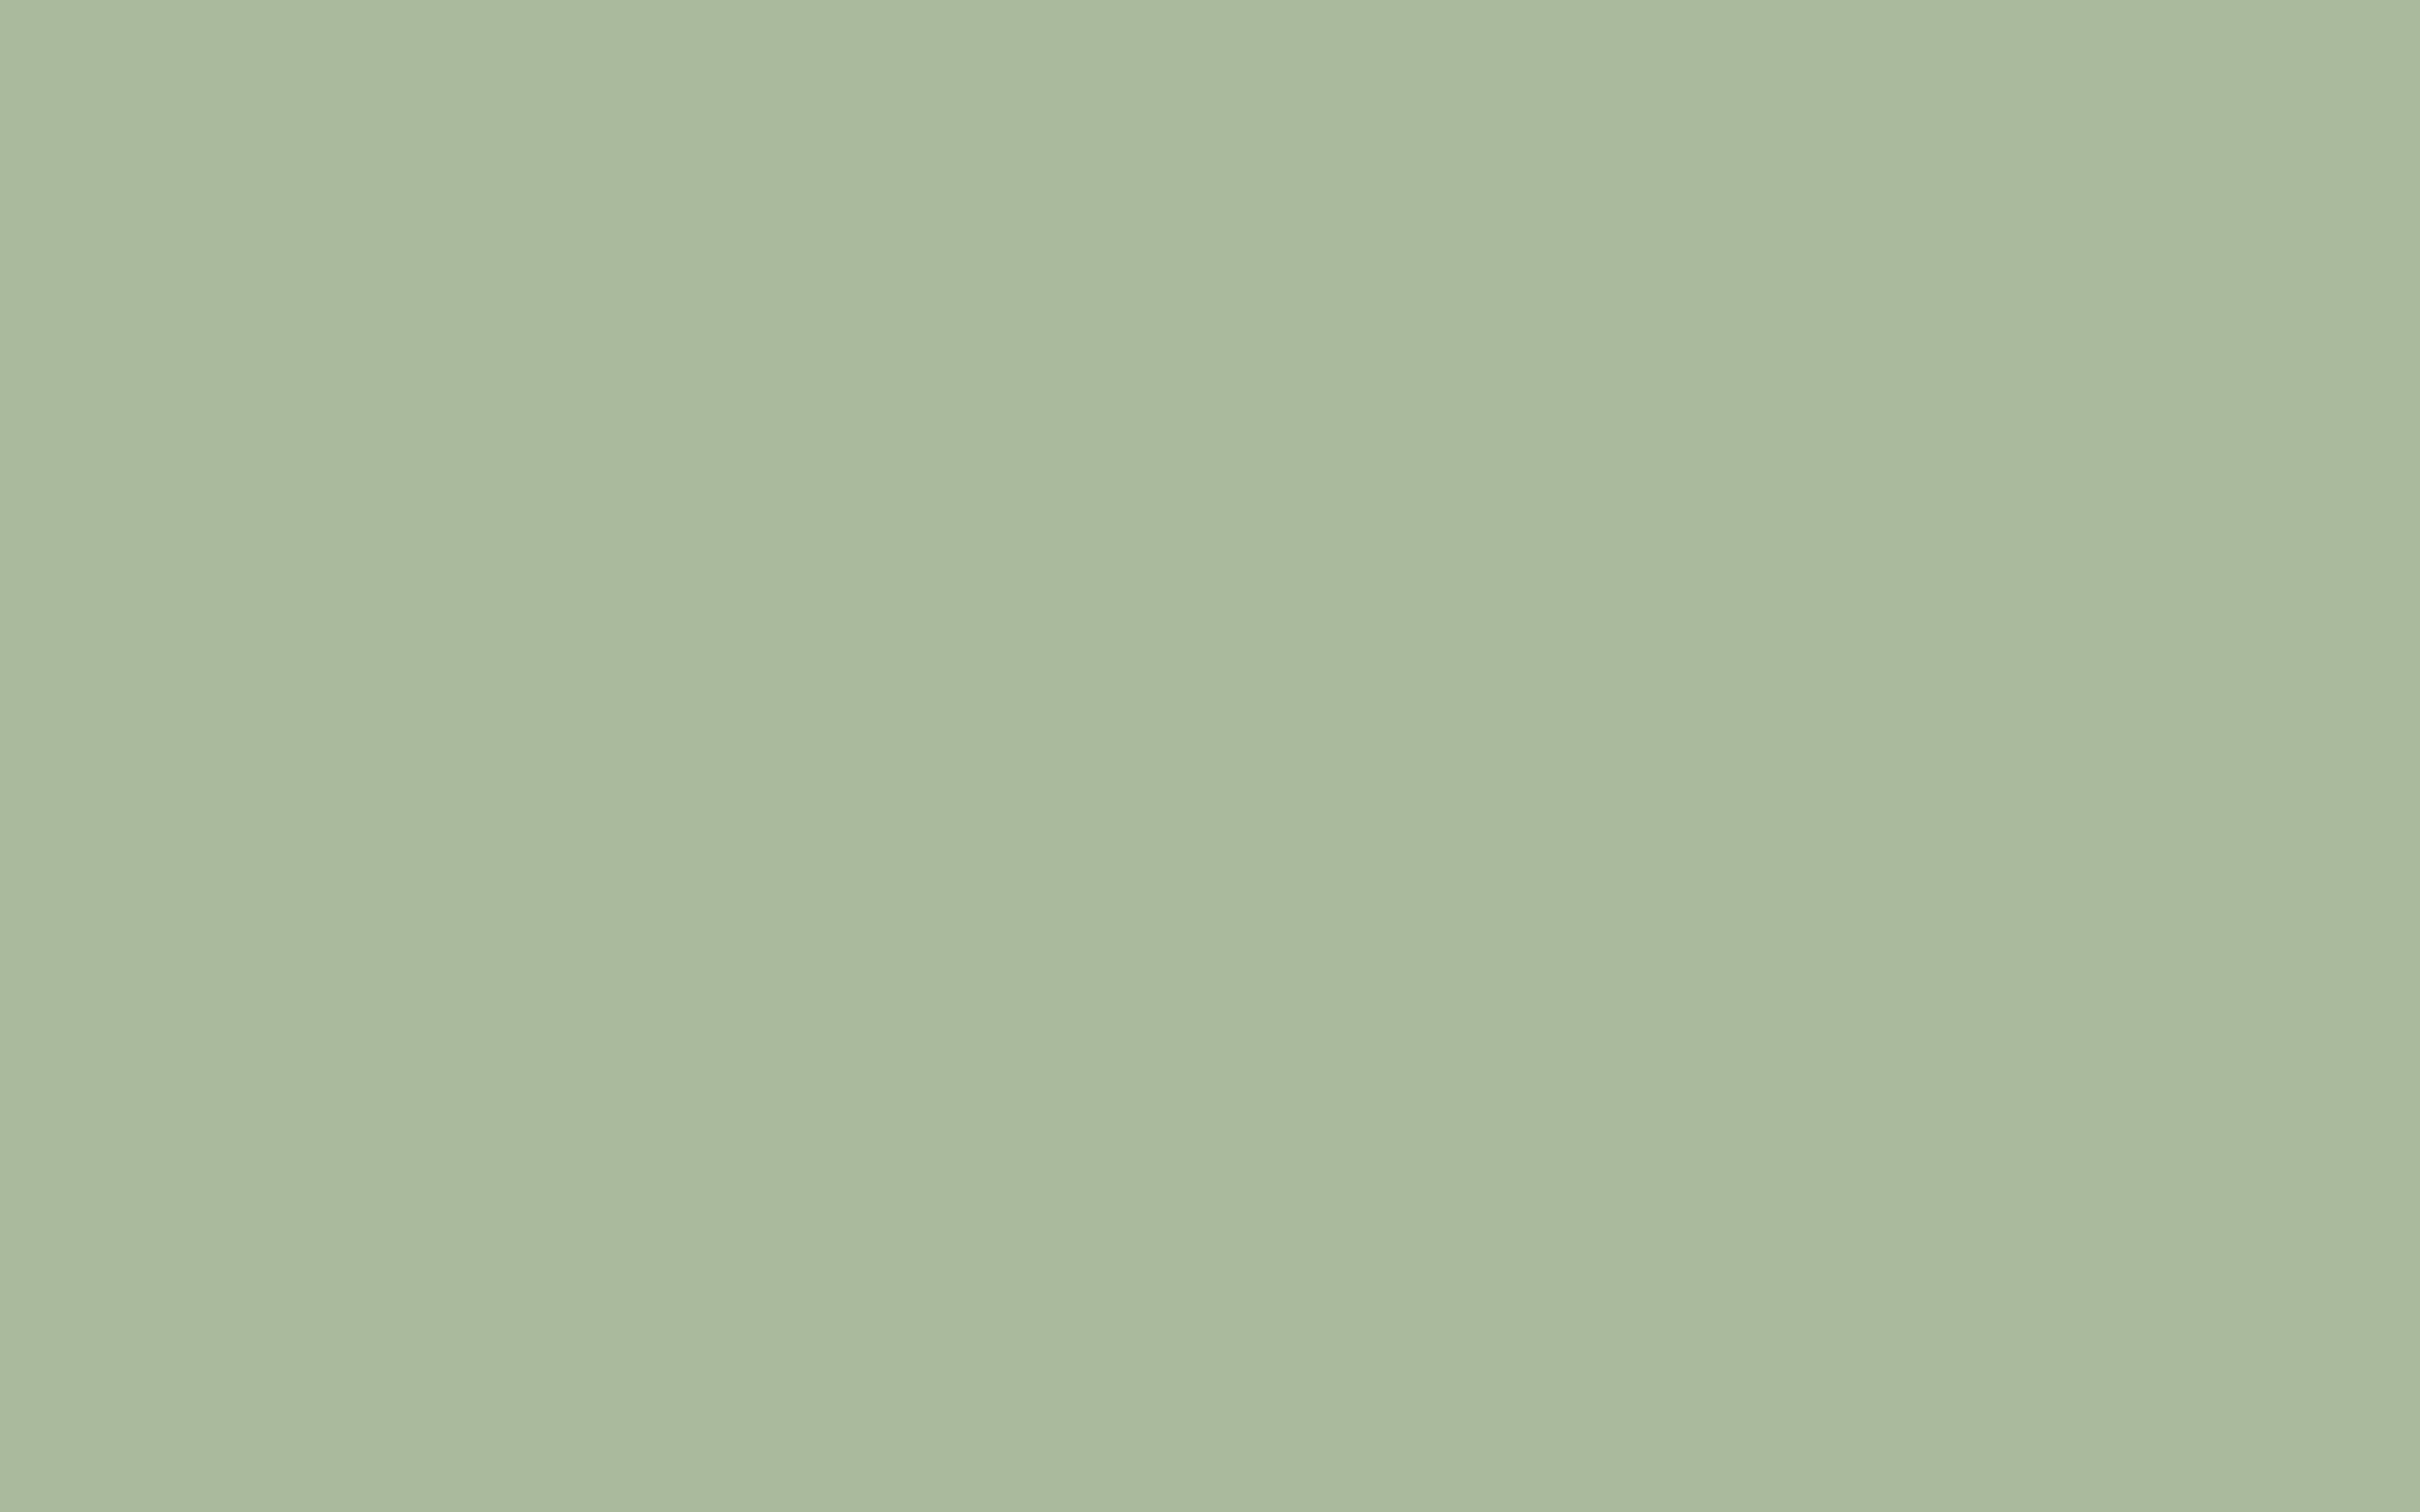 2560x1600 Laurel Green Solid Color Background